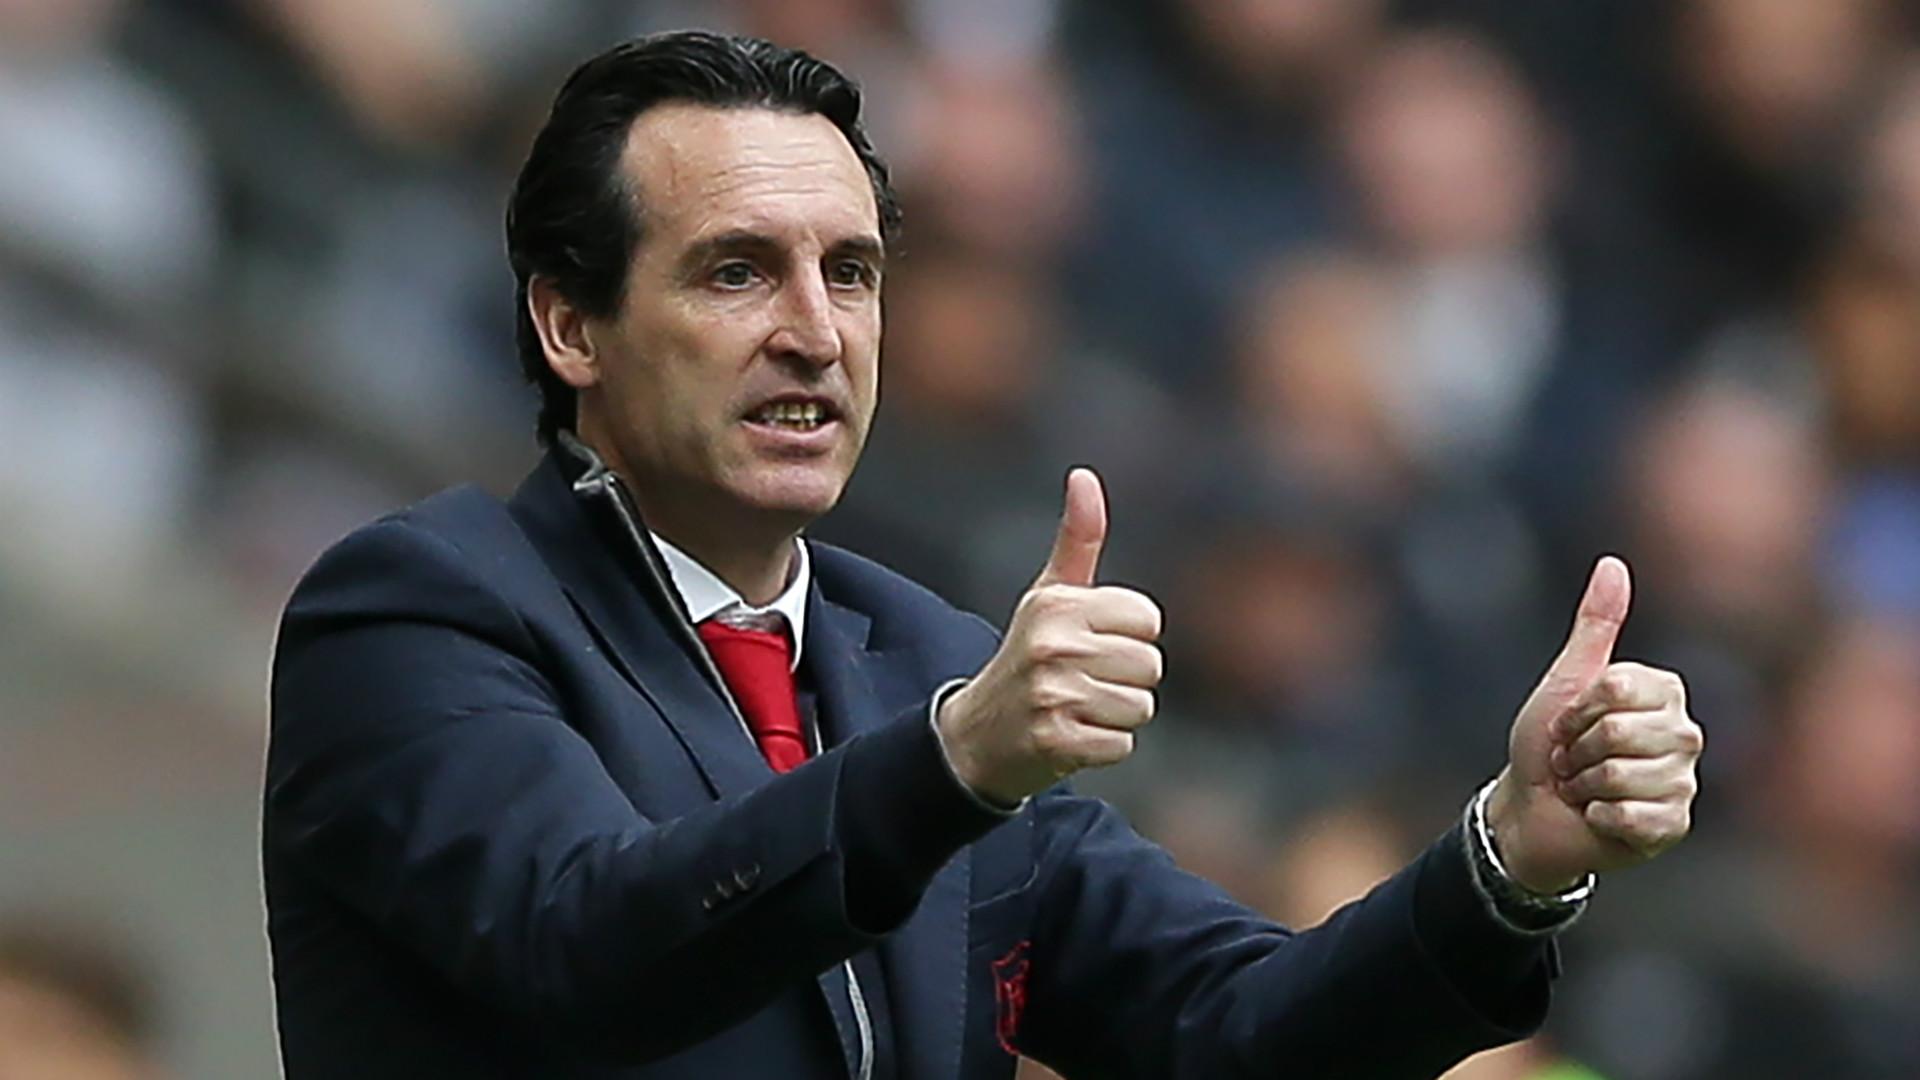 Ex-Arsenal boss Unai Emery returns to coaching with Villarreal role